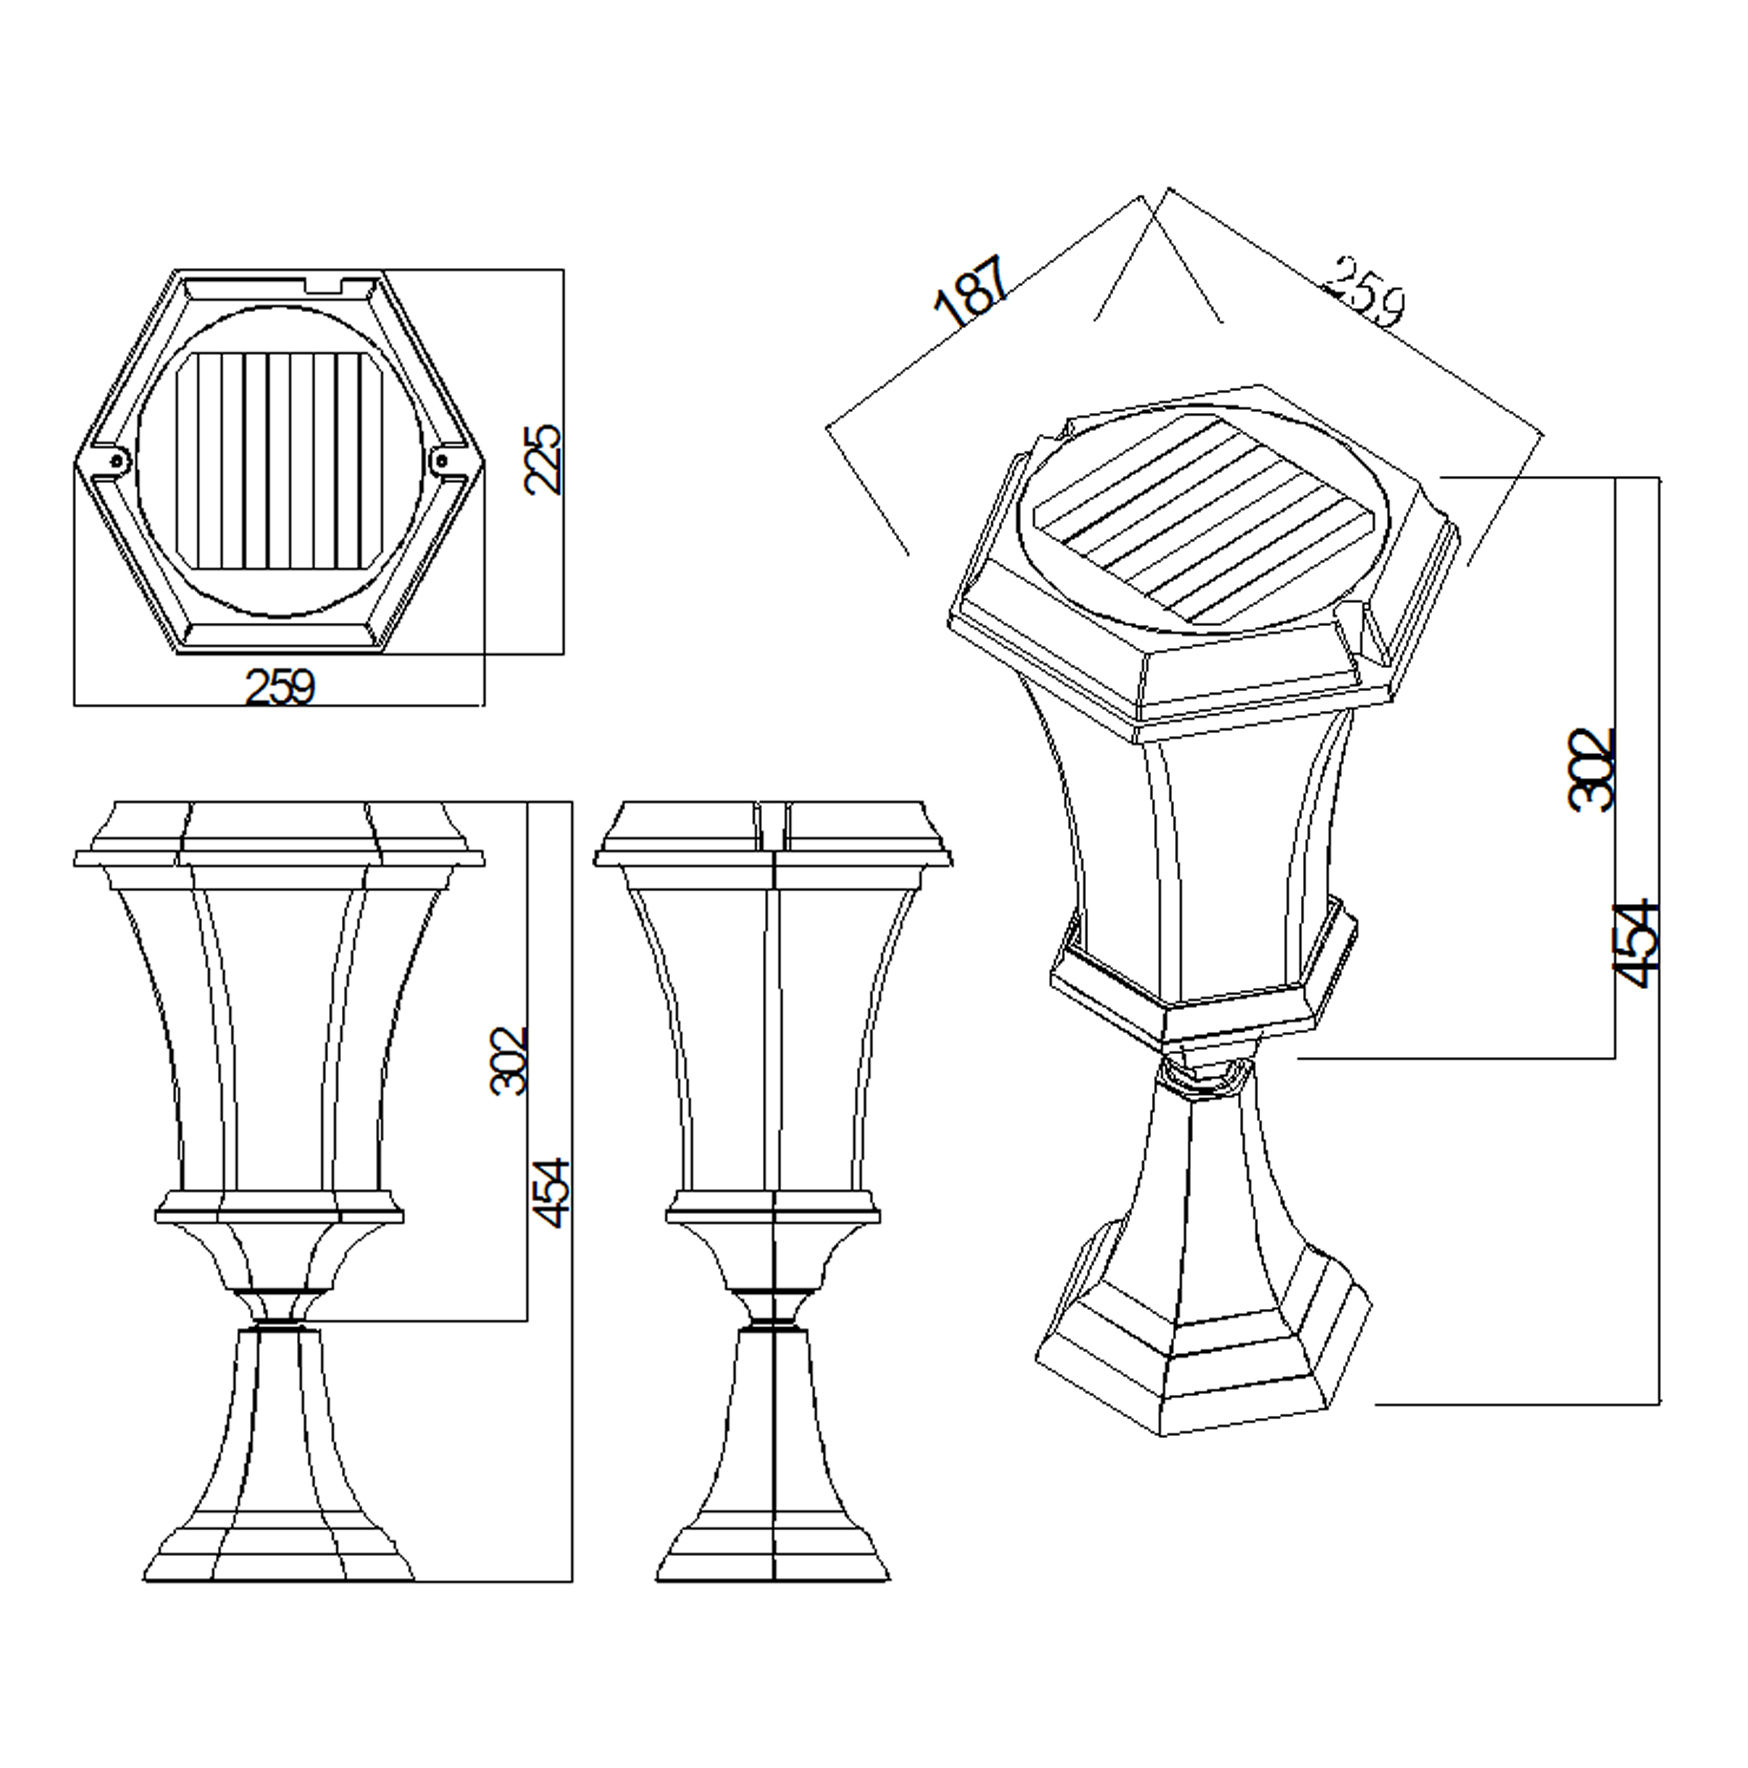 Solamon Pedestal Line Drawing